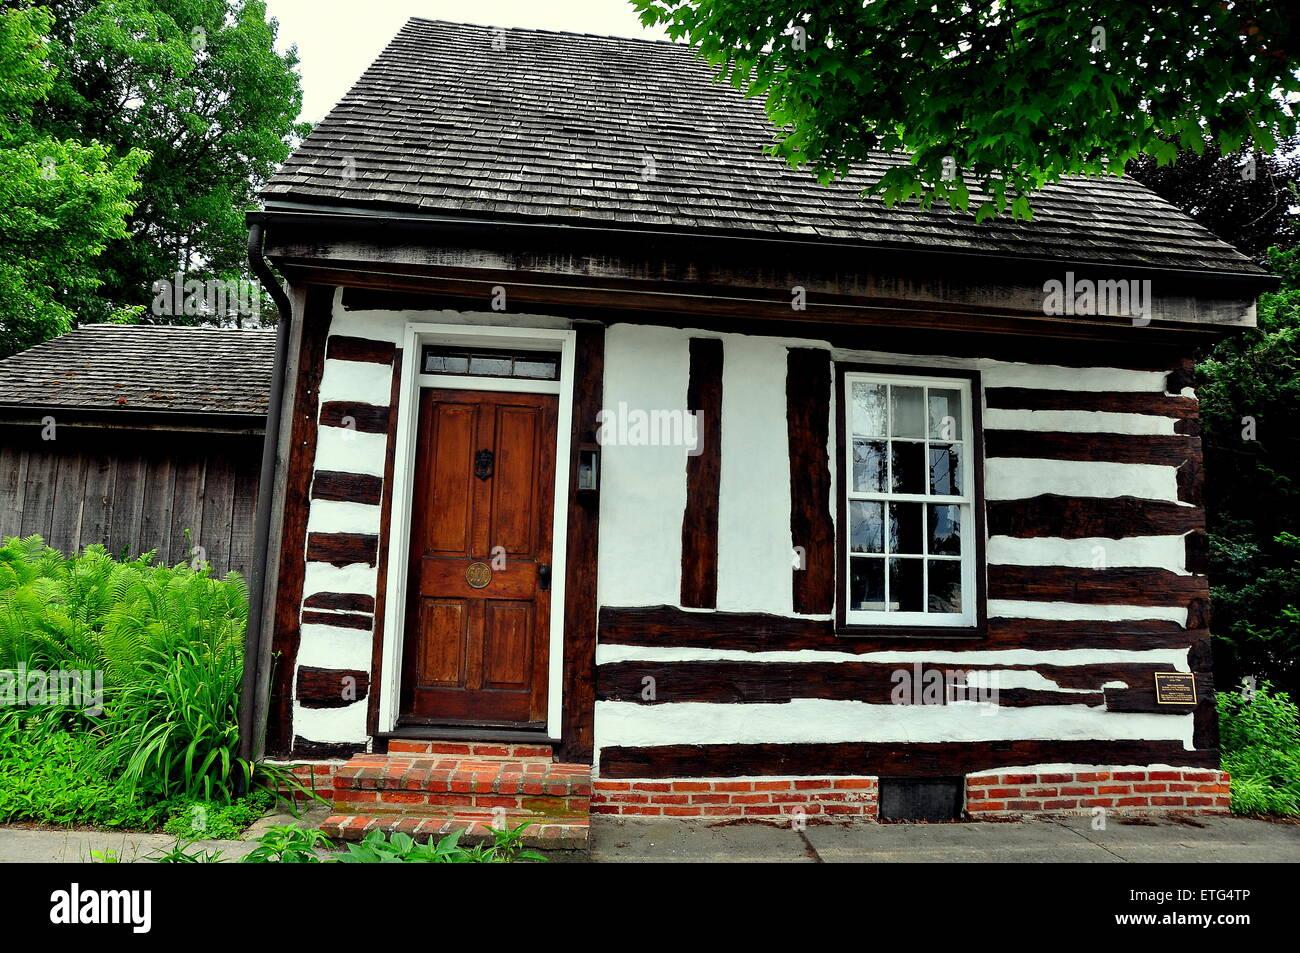 Lititz, Pennsylvania:  A fachwerk half-timbered 18rh century cottage on Market Street  * - Stock Image